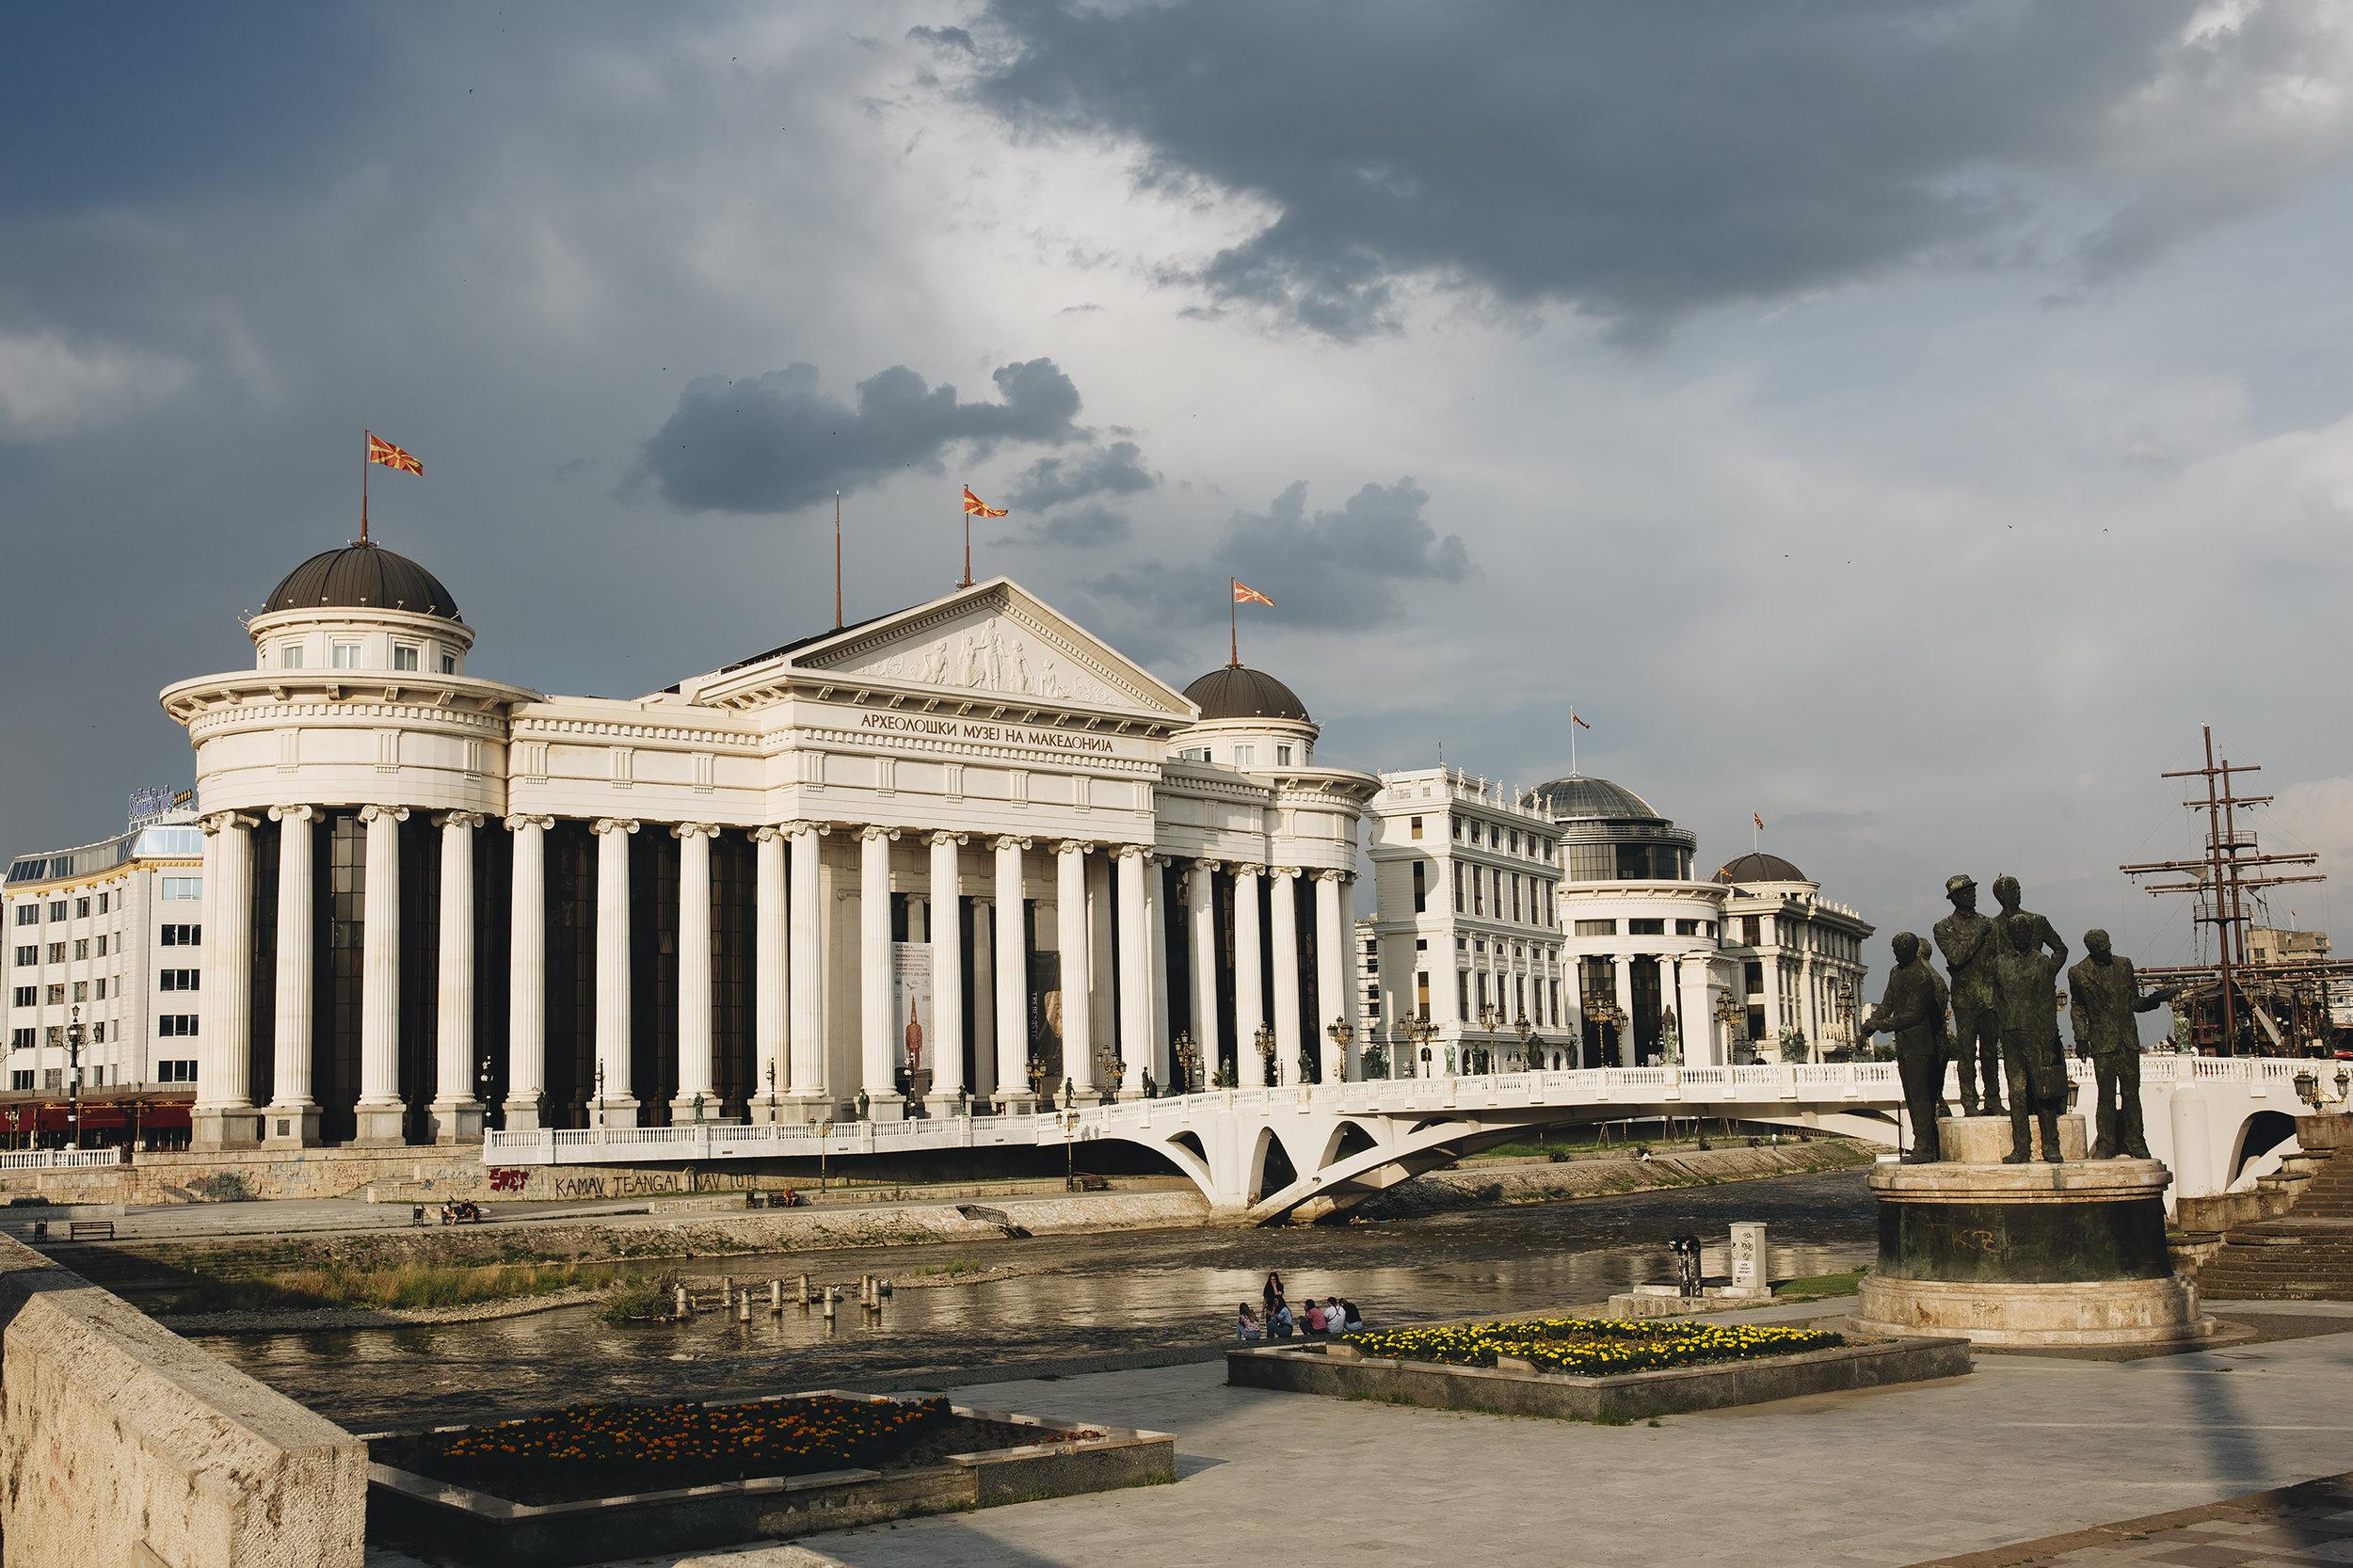 chrissihernandez-north-macedonia-skopje (36)copy3000.jpg